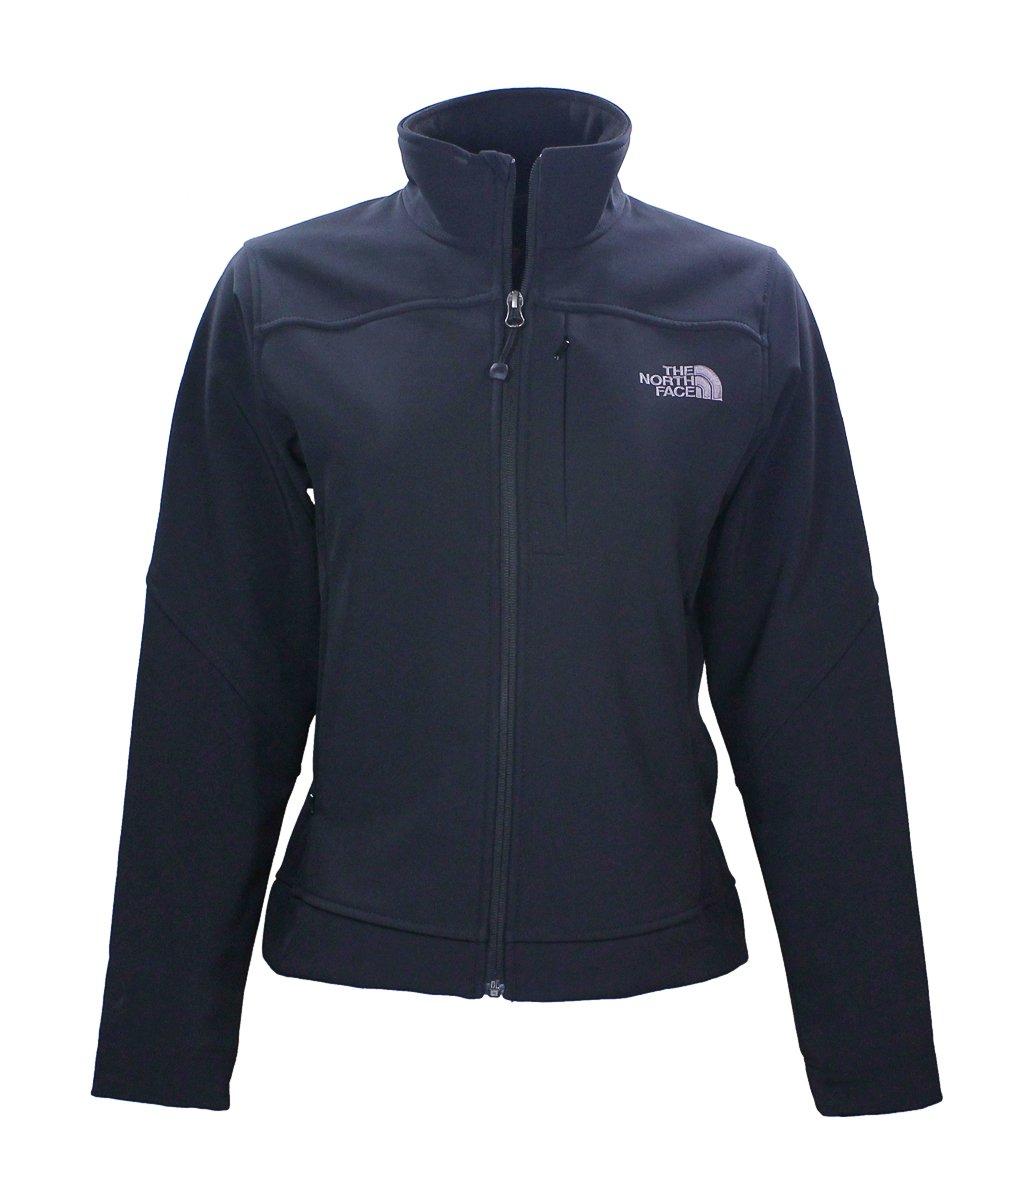 4a42186ec3b5 Amazon.com   The North Face Women s Caroleena Soft Shell Jacket Windproof -  Black   Sports   Outdoors